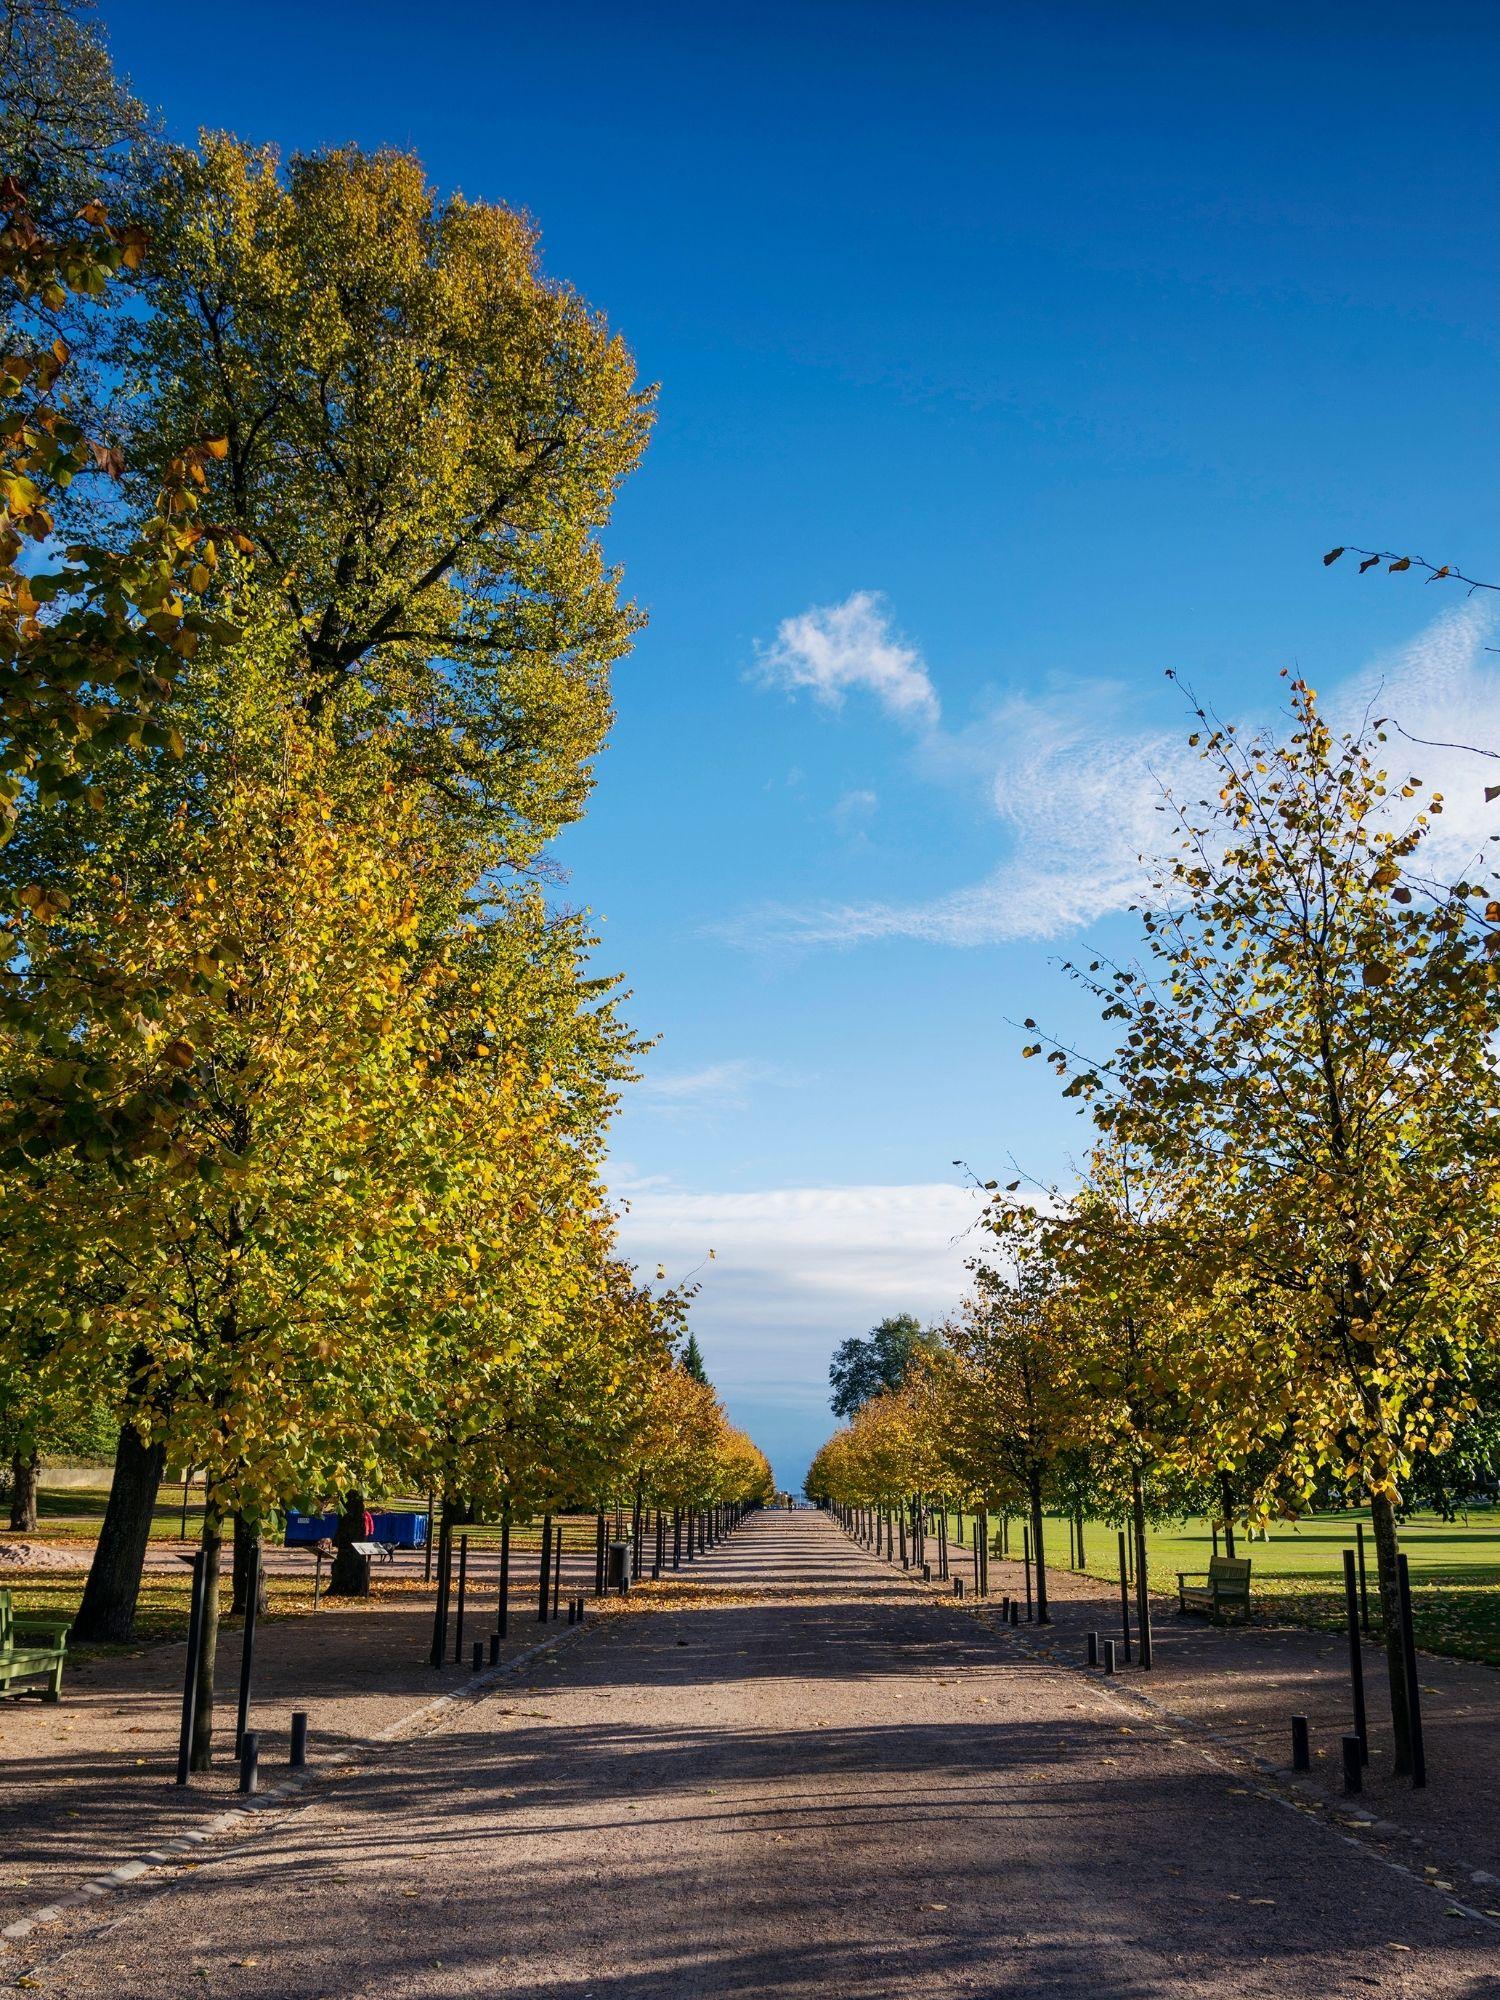 Helsinki Tree Lined Park